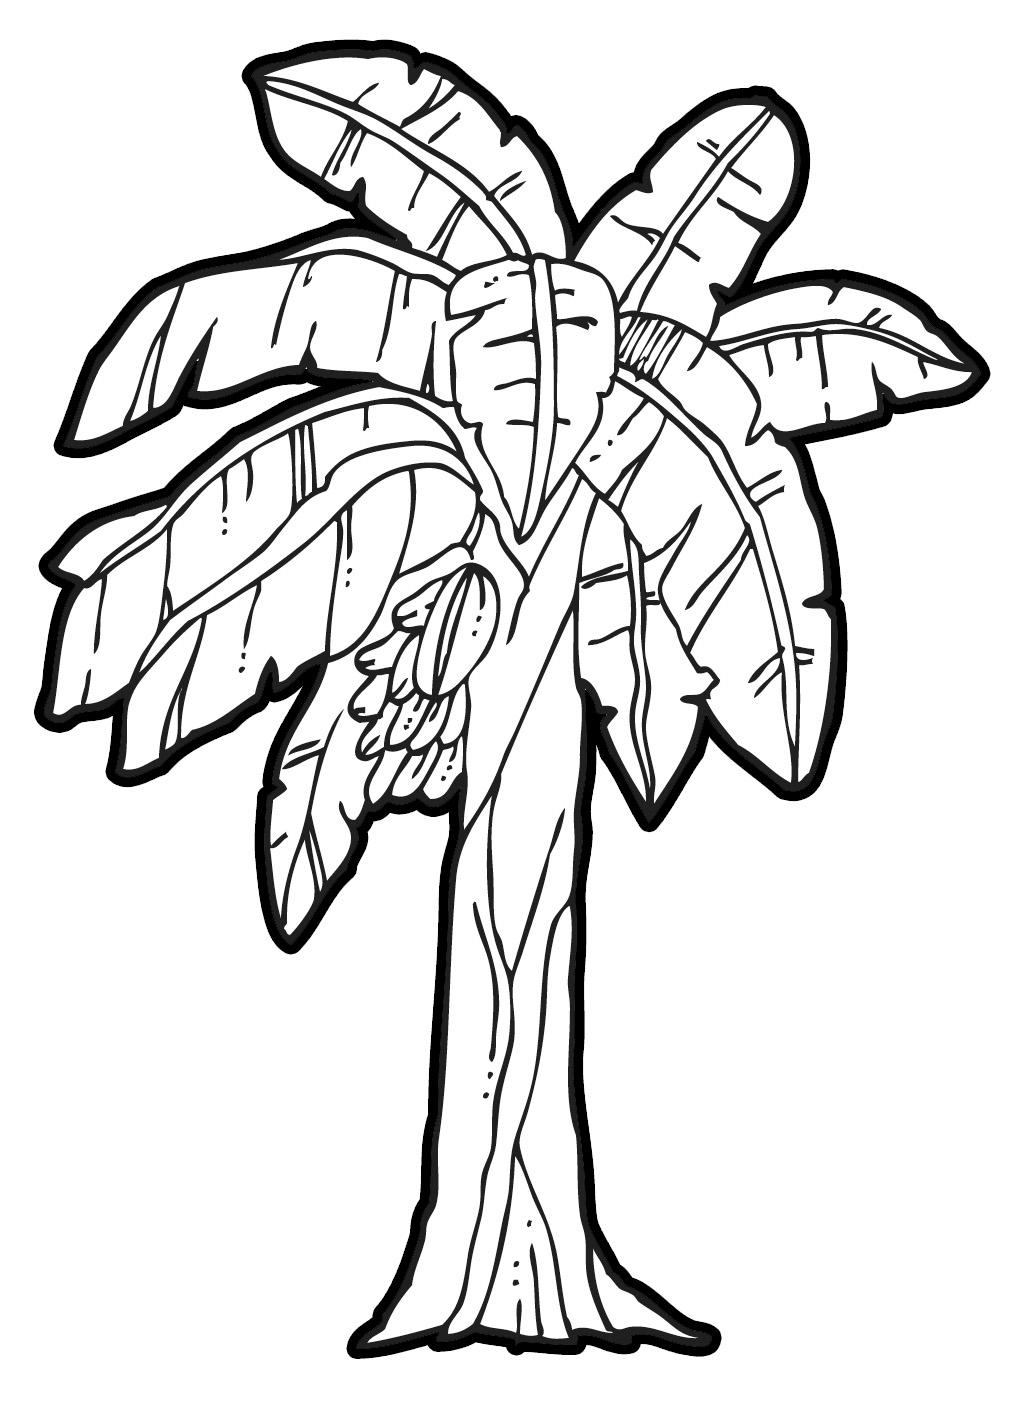 Drawing of pencil and. Banana clipart tree